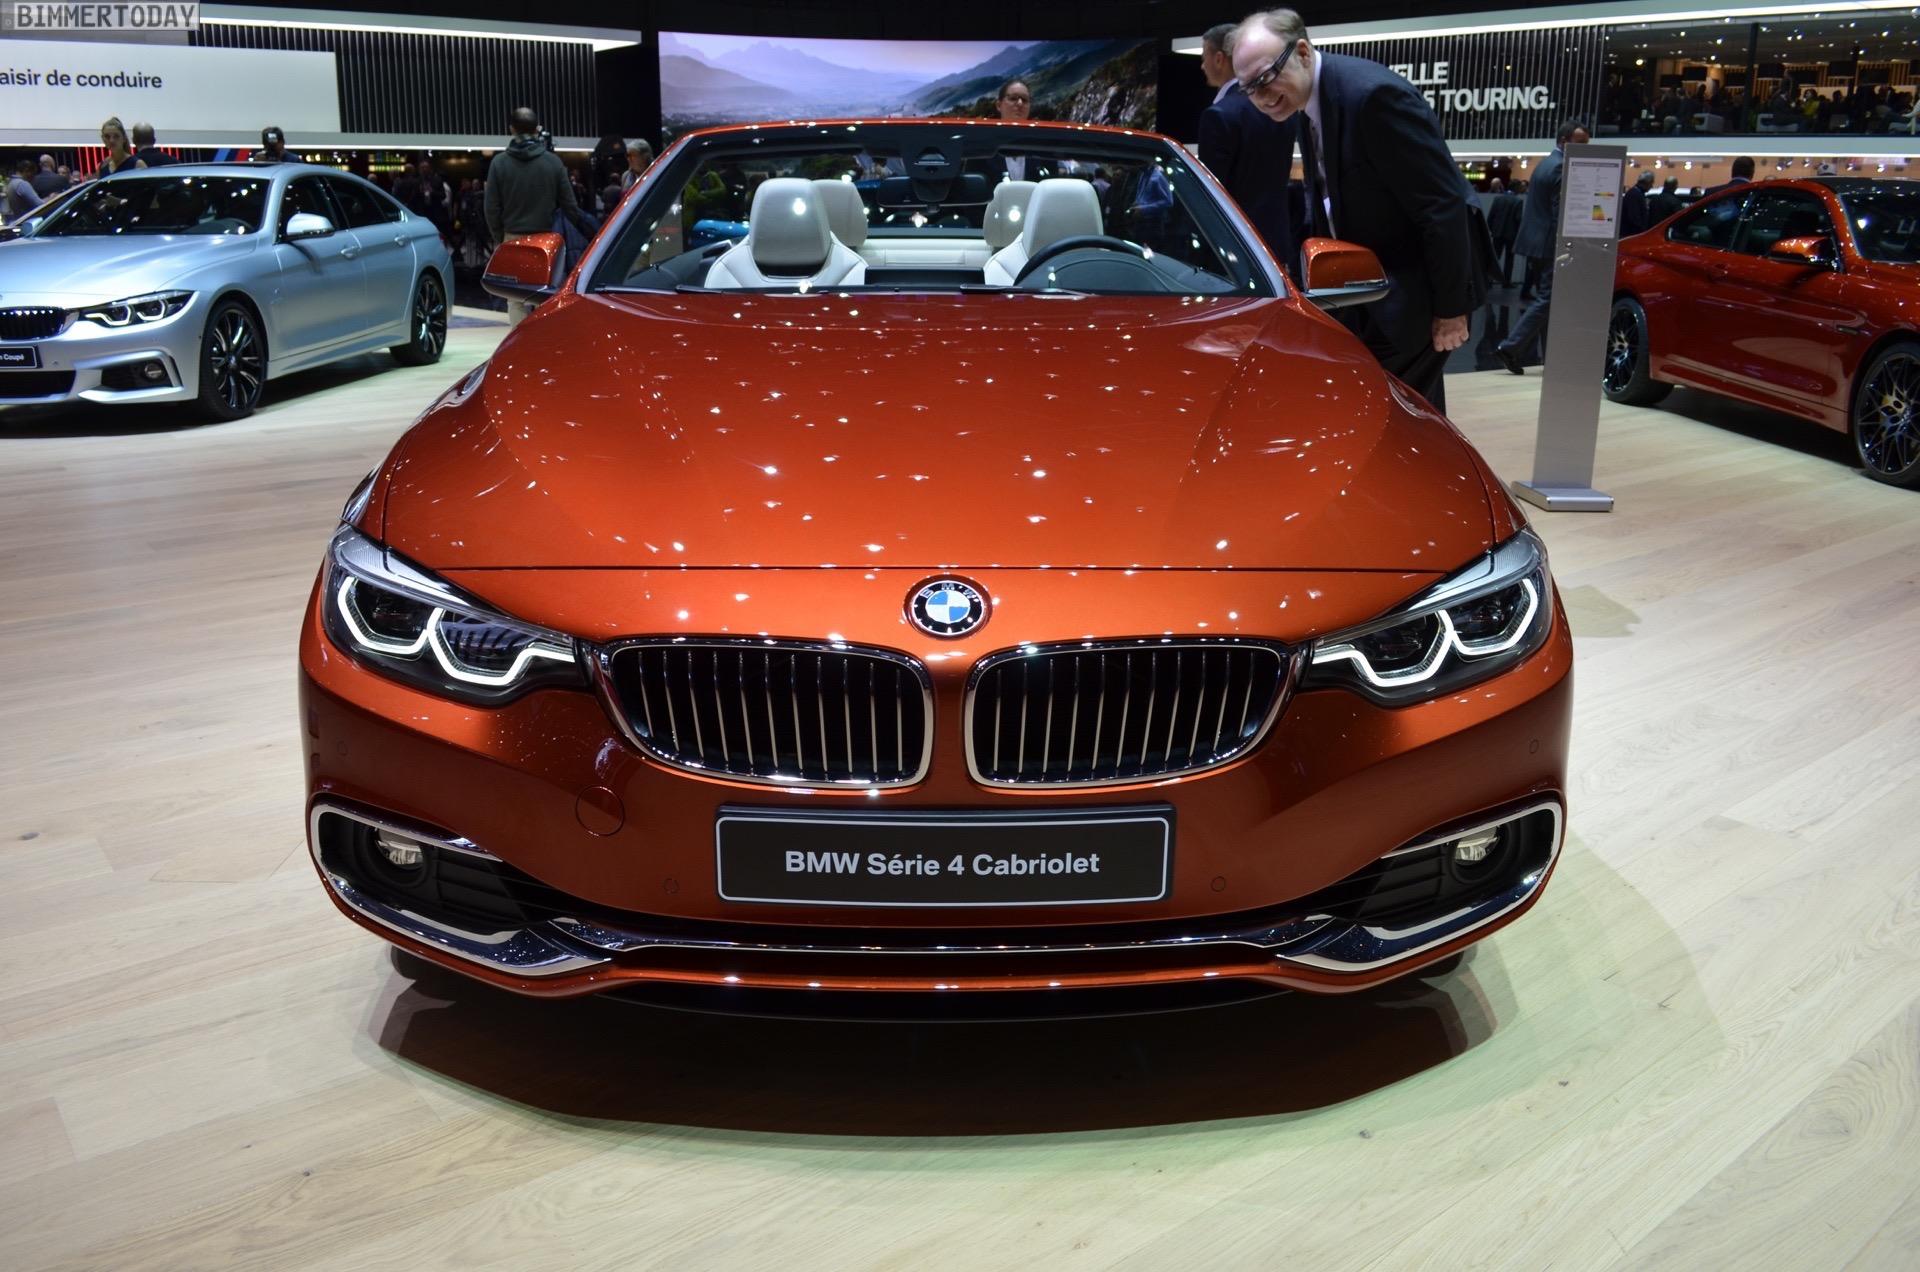 2017 Geneva Bmw 4 Series Convertible Facelift In Sunburst Orange